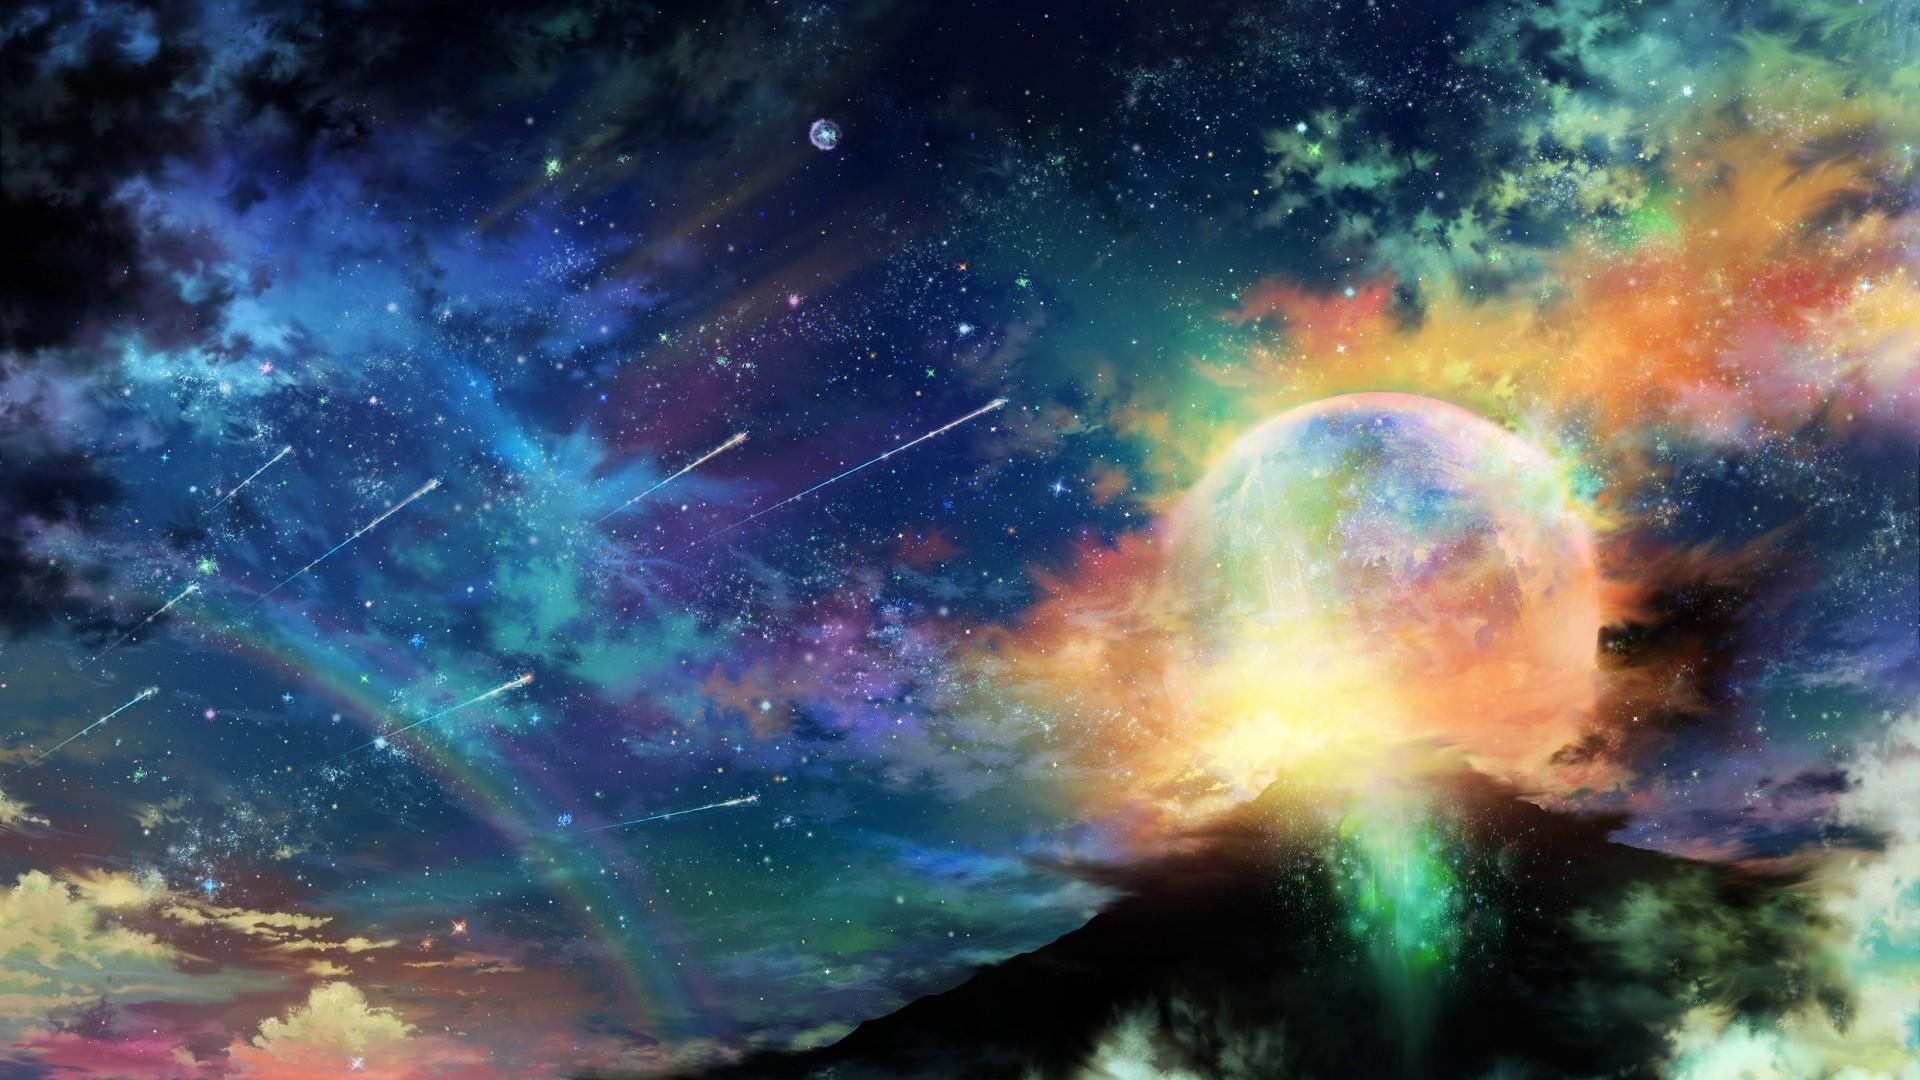 Colorful Space Landscape Wallpaper Colorful Galaxy Wallpaper Hd 804x452 Download Hd Wallpaper Wallpapertip